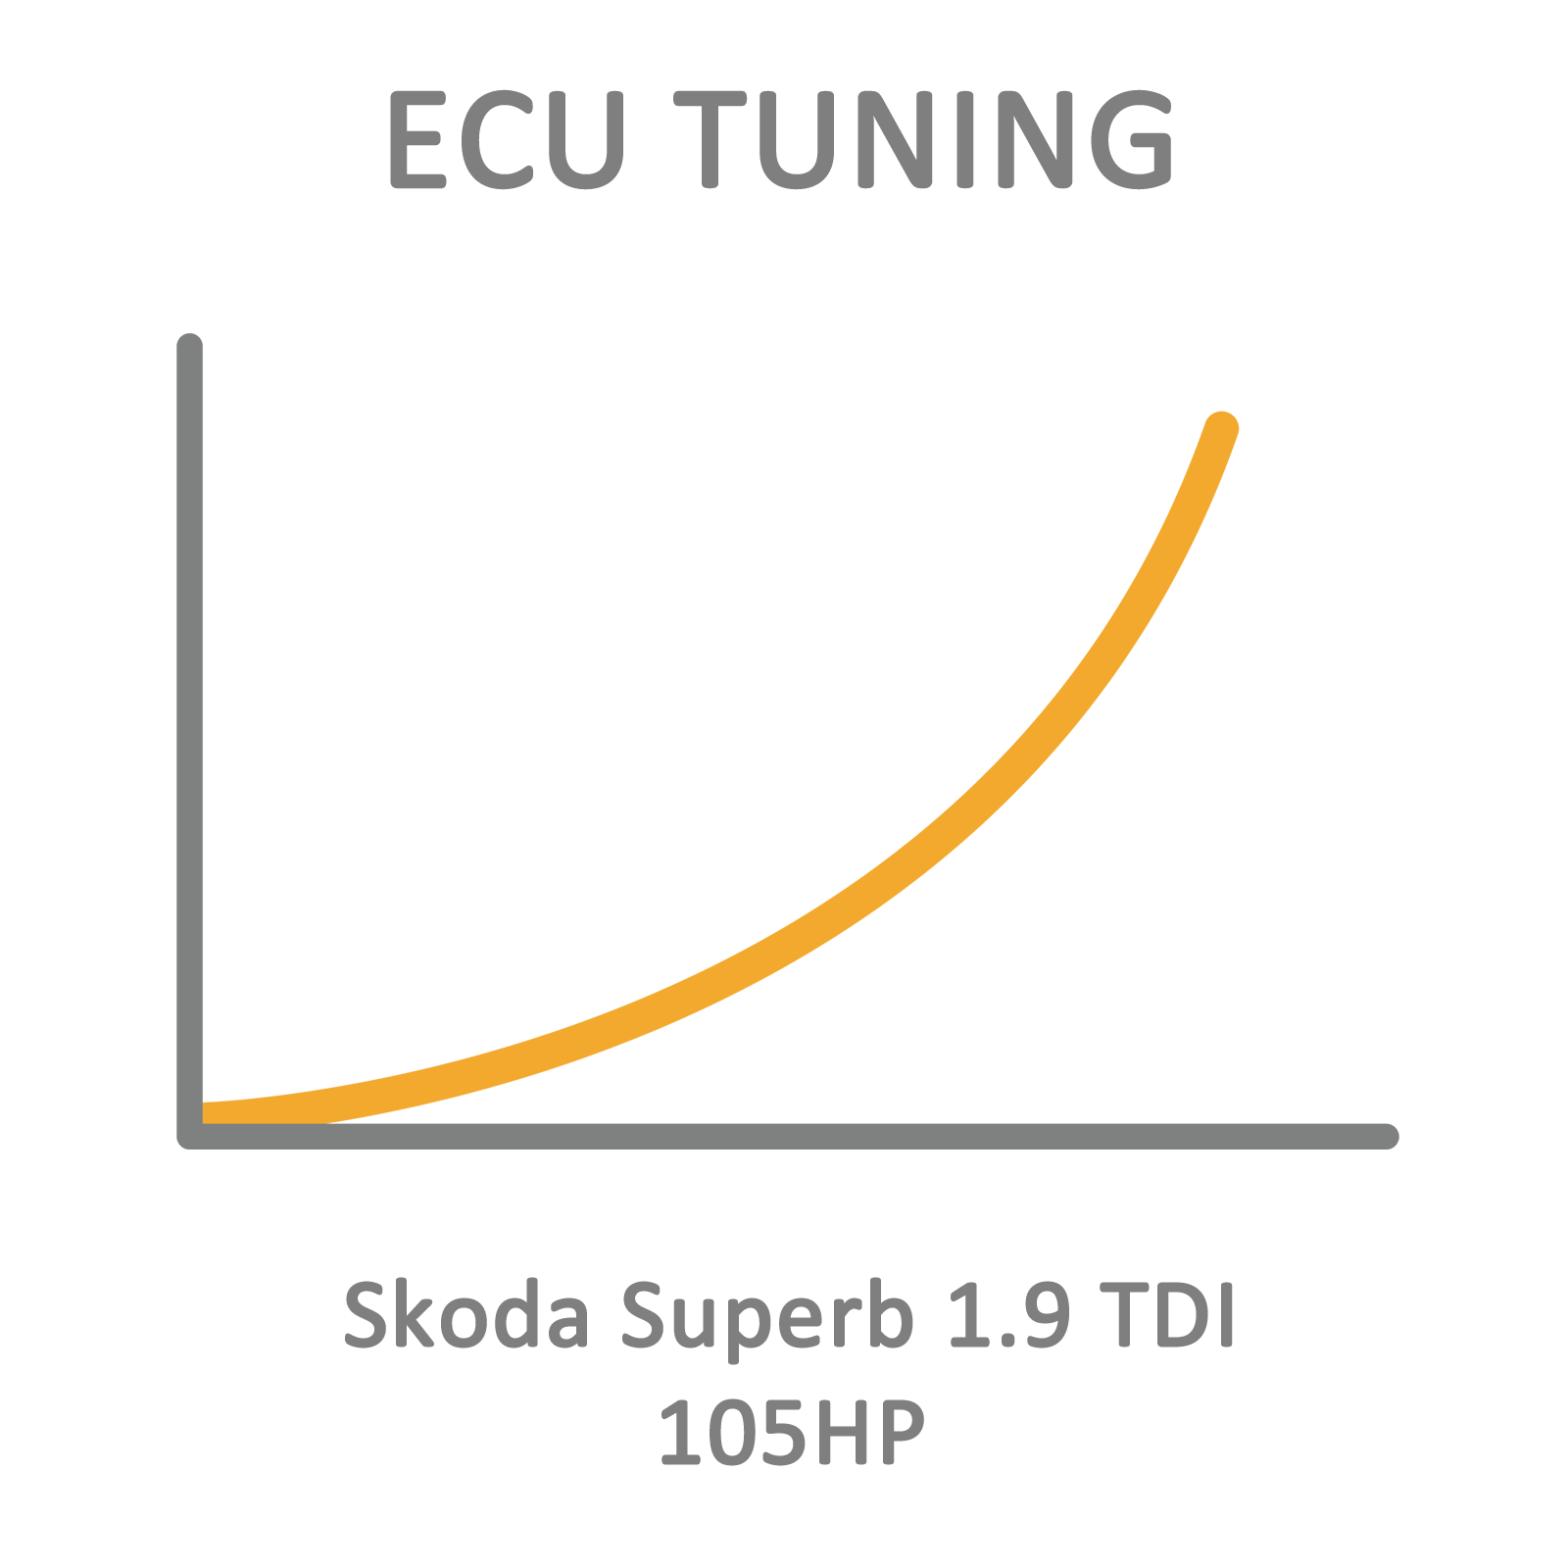 Skoda Superb 1.9 TDI 105HP ECU Tuning Remapping Programming